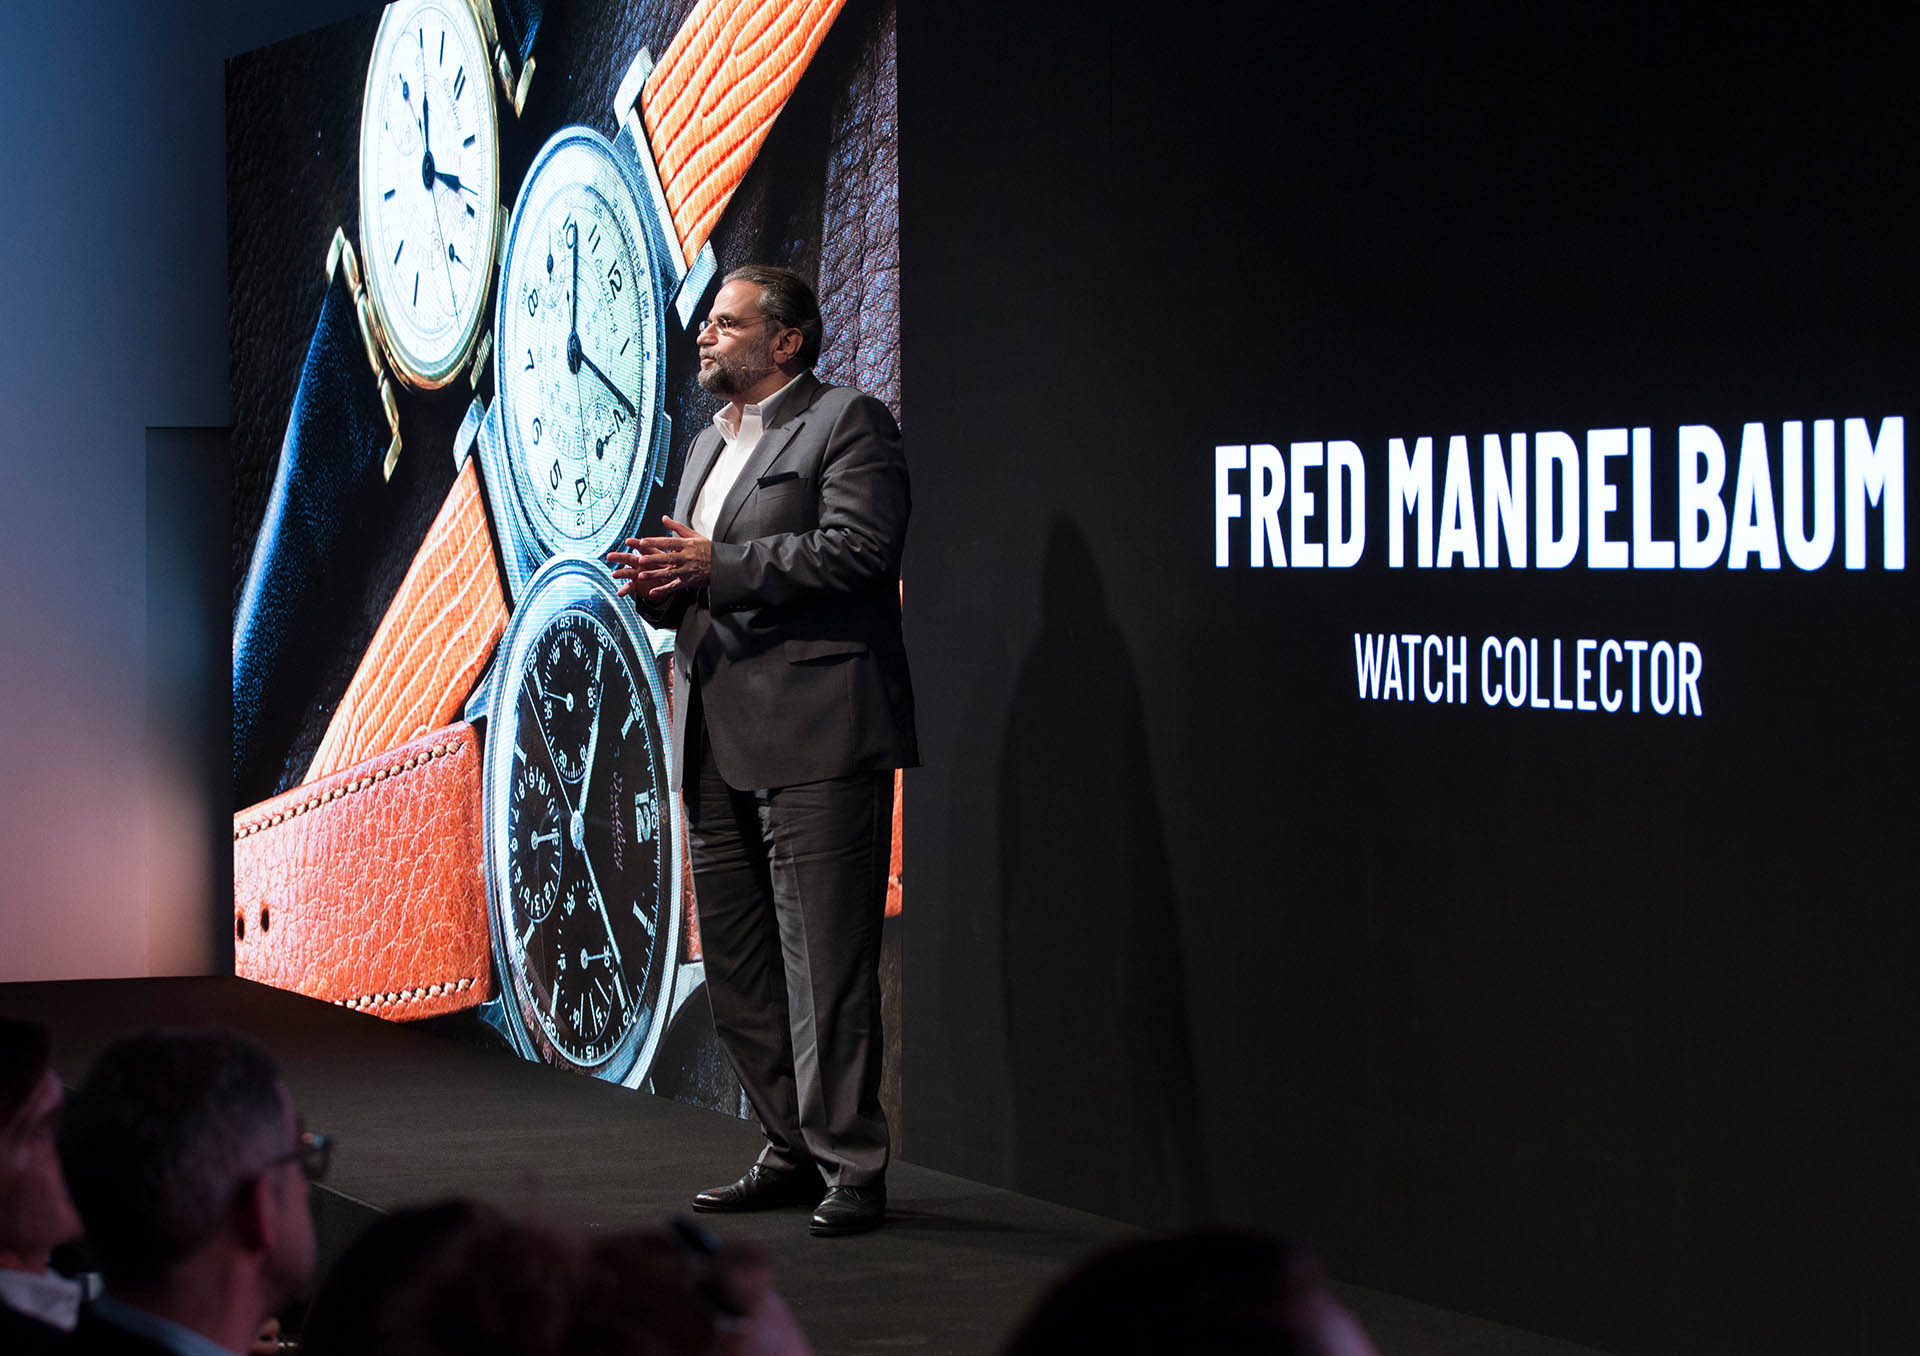 Fred Mandelbaum auf dem Breitling Summit in London am 22. Oktober 2018